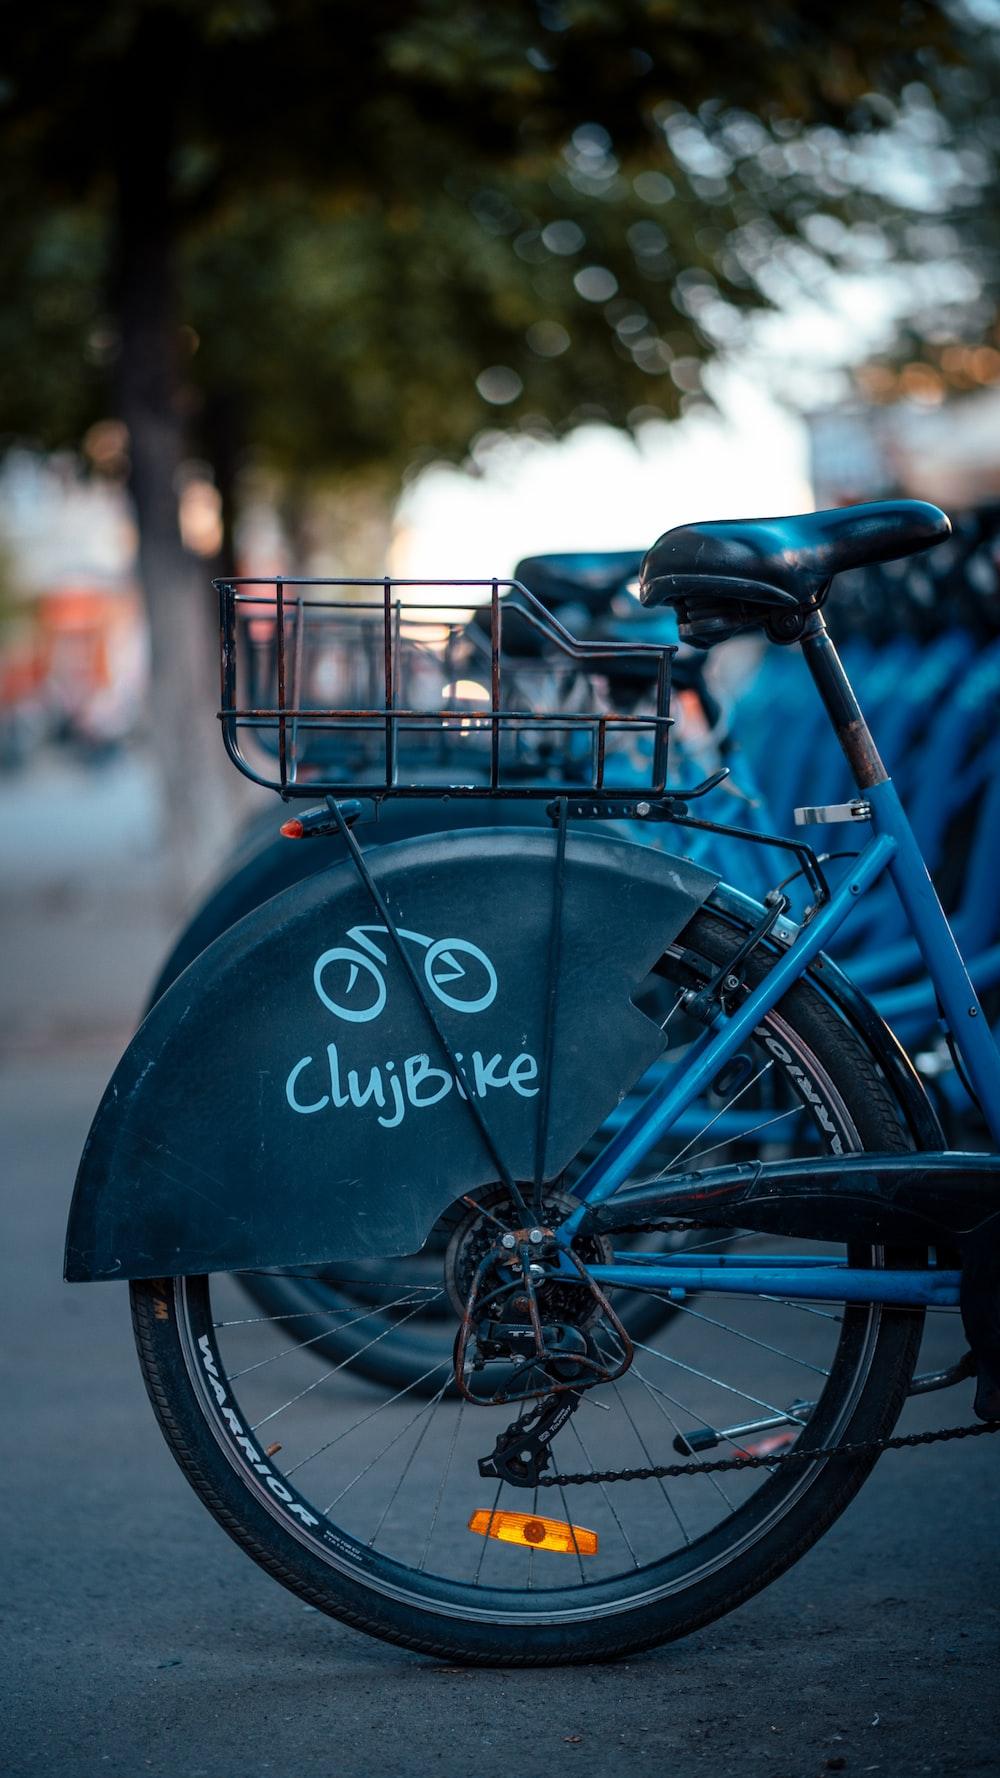 blue and black ClujBike bicycle